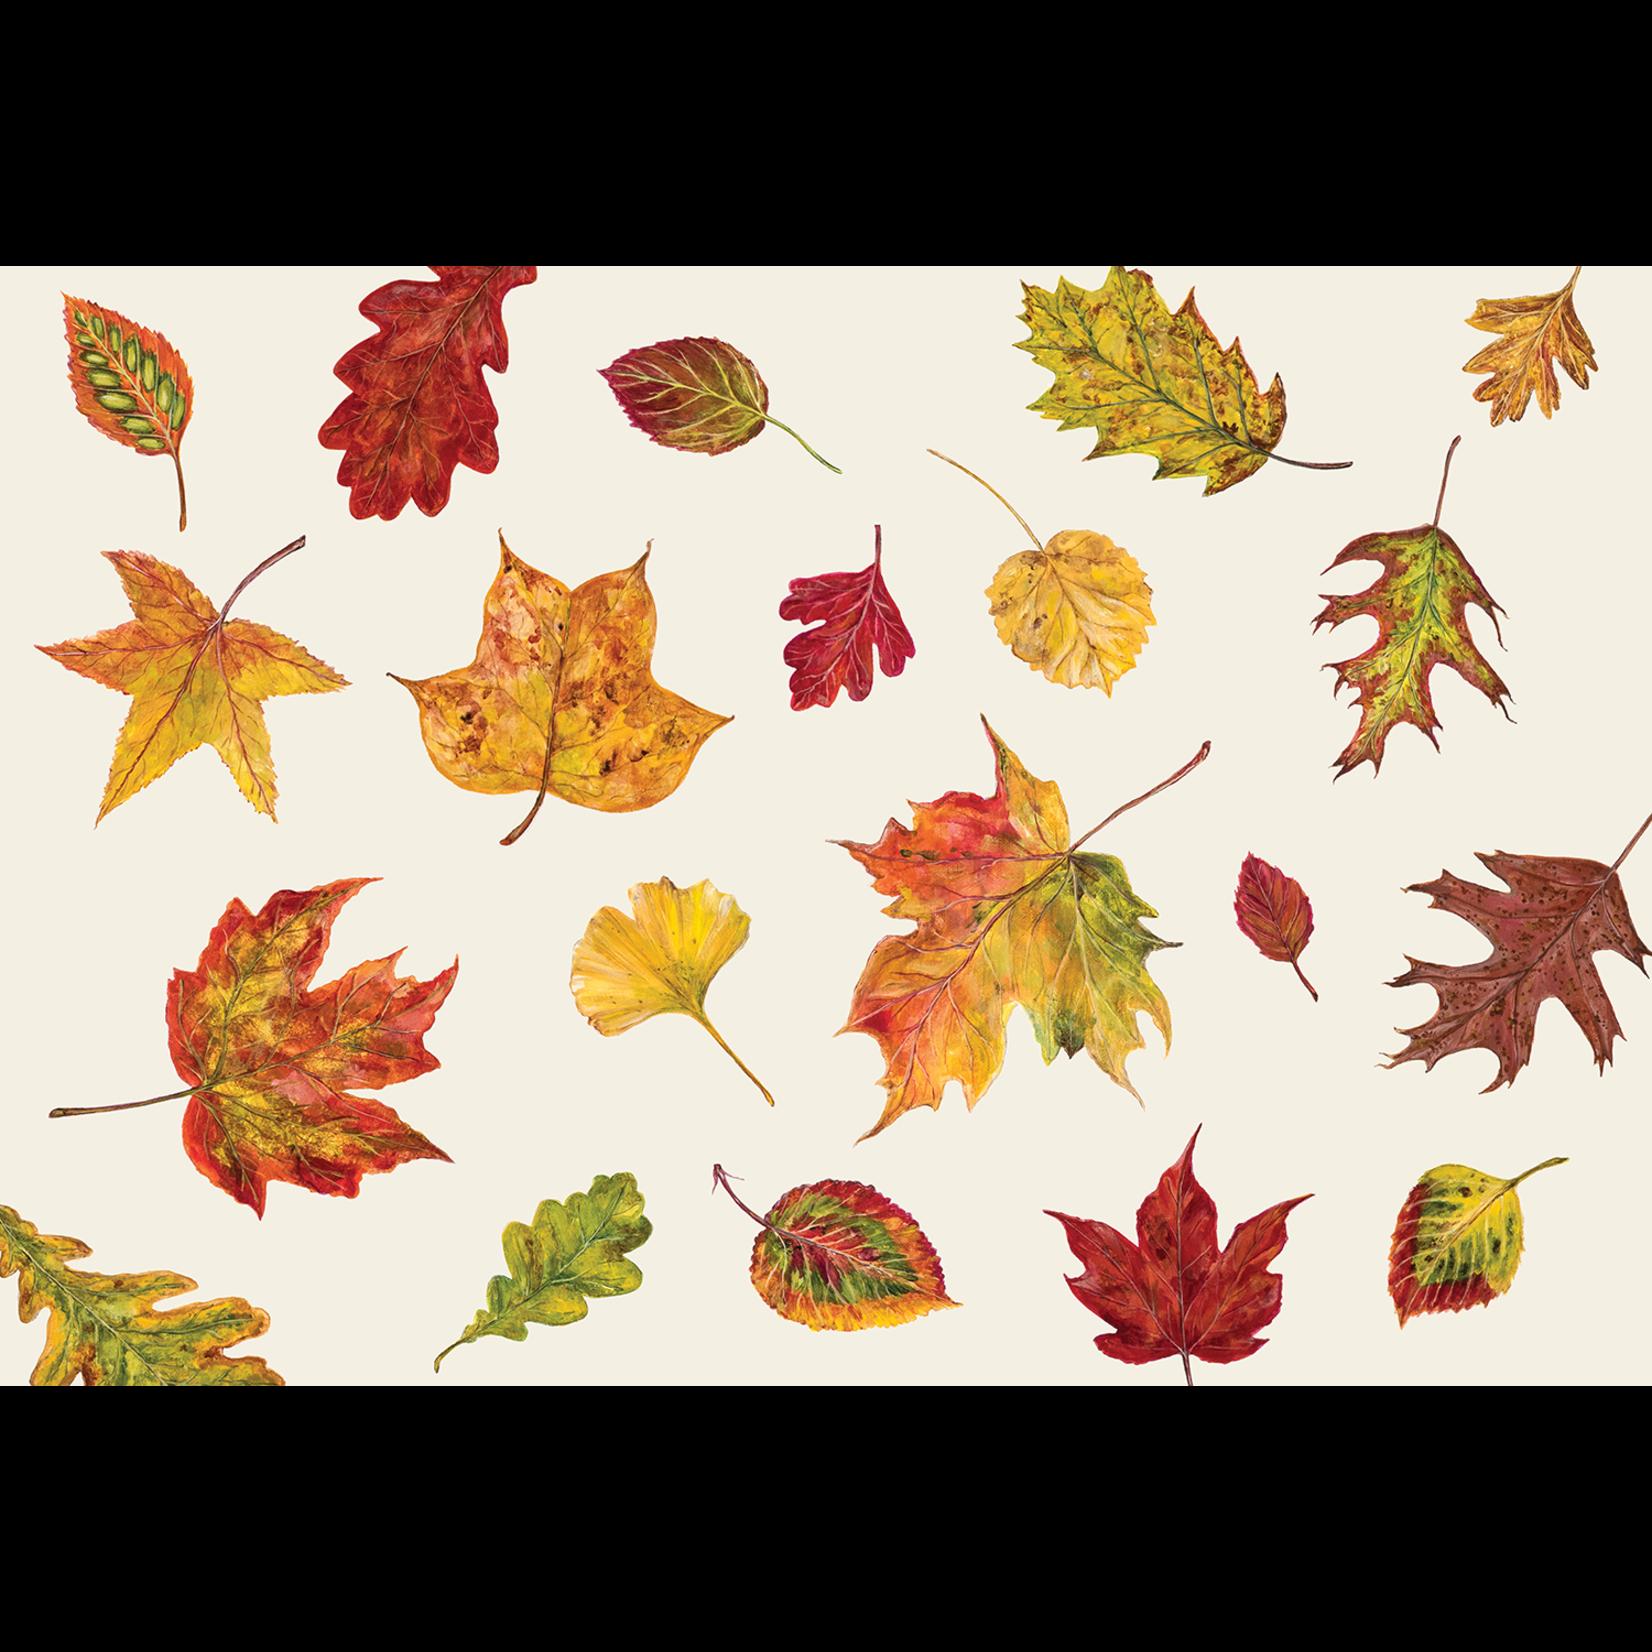 Fall Foliage Placemat- 24 Sheets